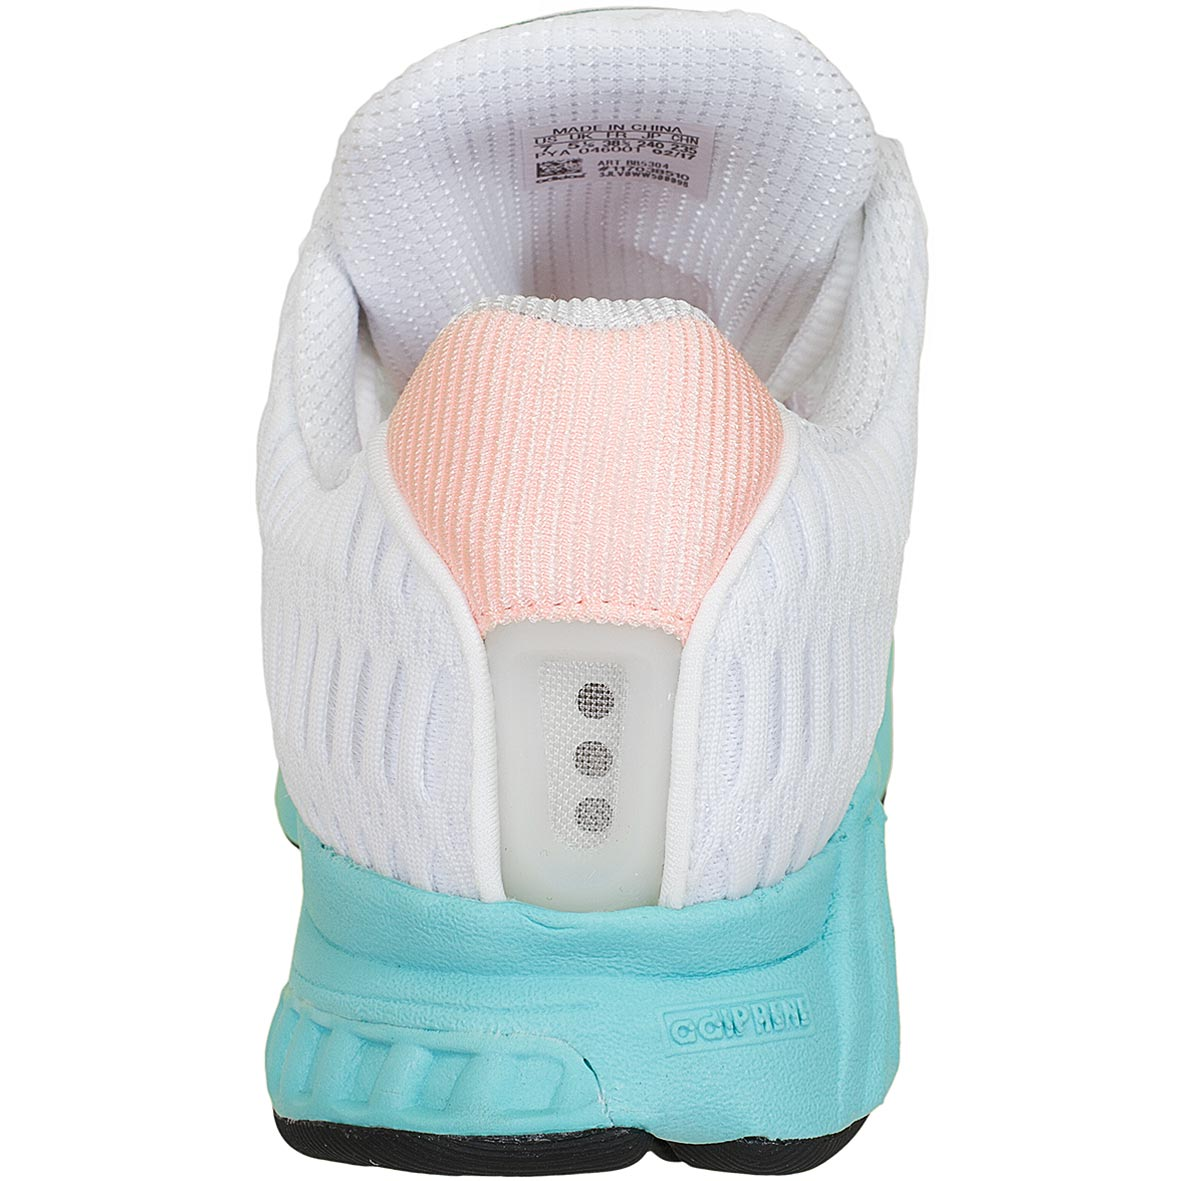 e80d1fb199f811 ☆ Adidas Originals Damen Sneaker Clima Cool 1 weiß mint - hier ...